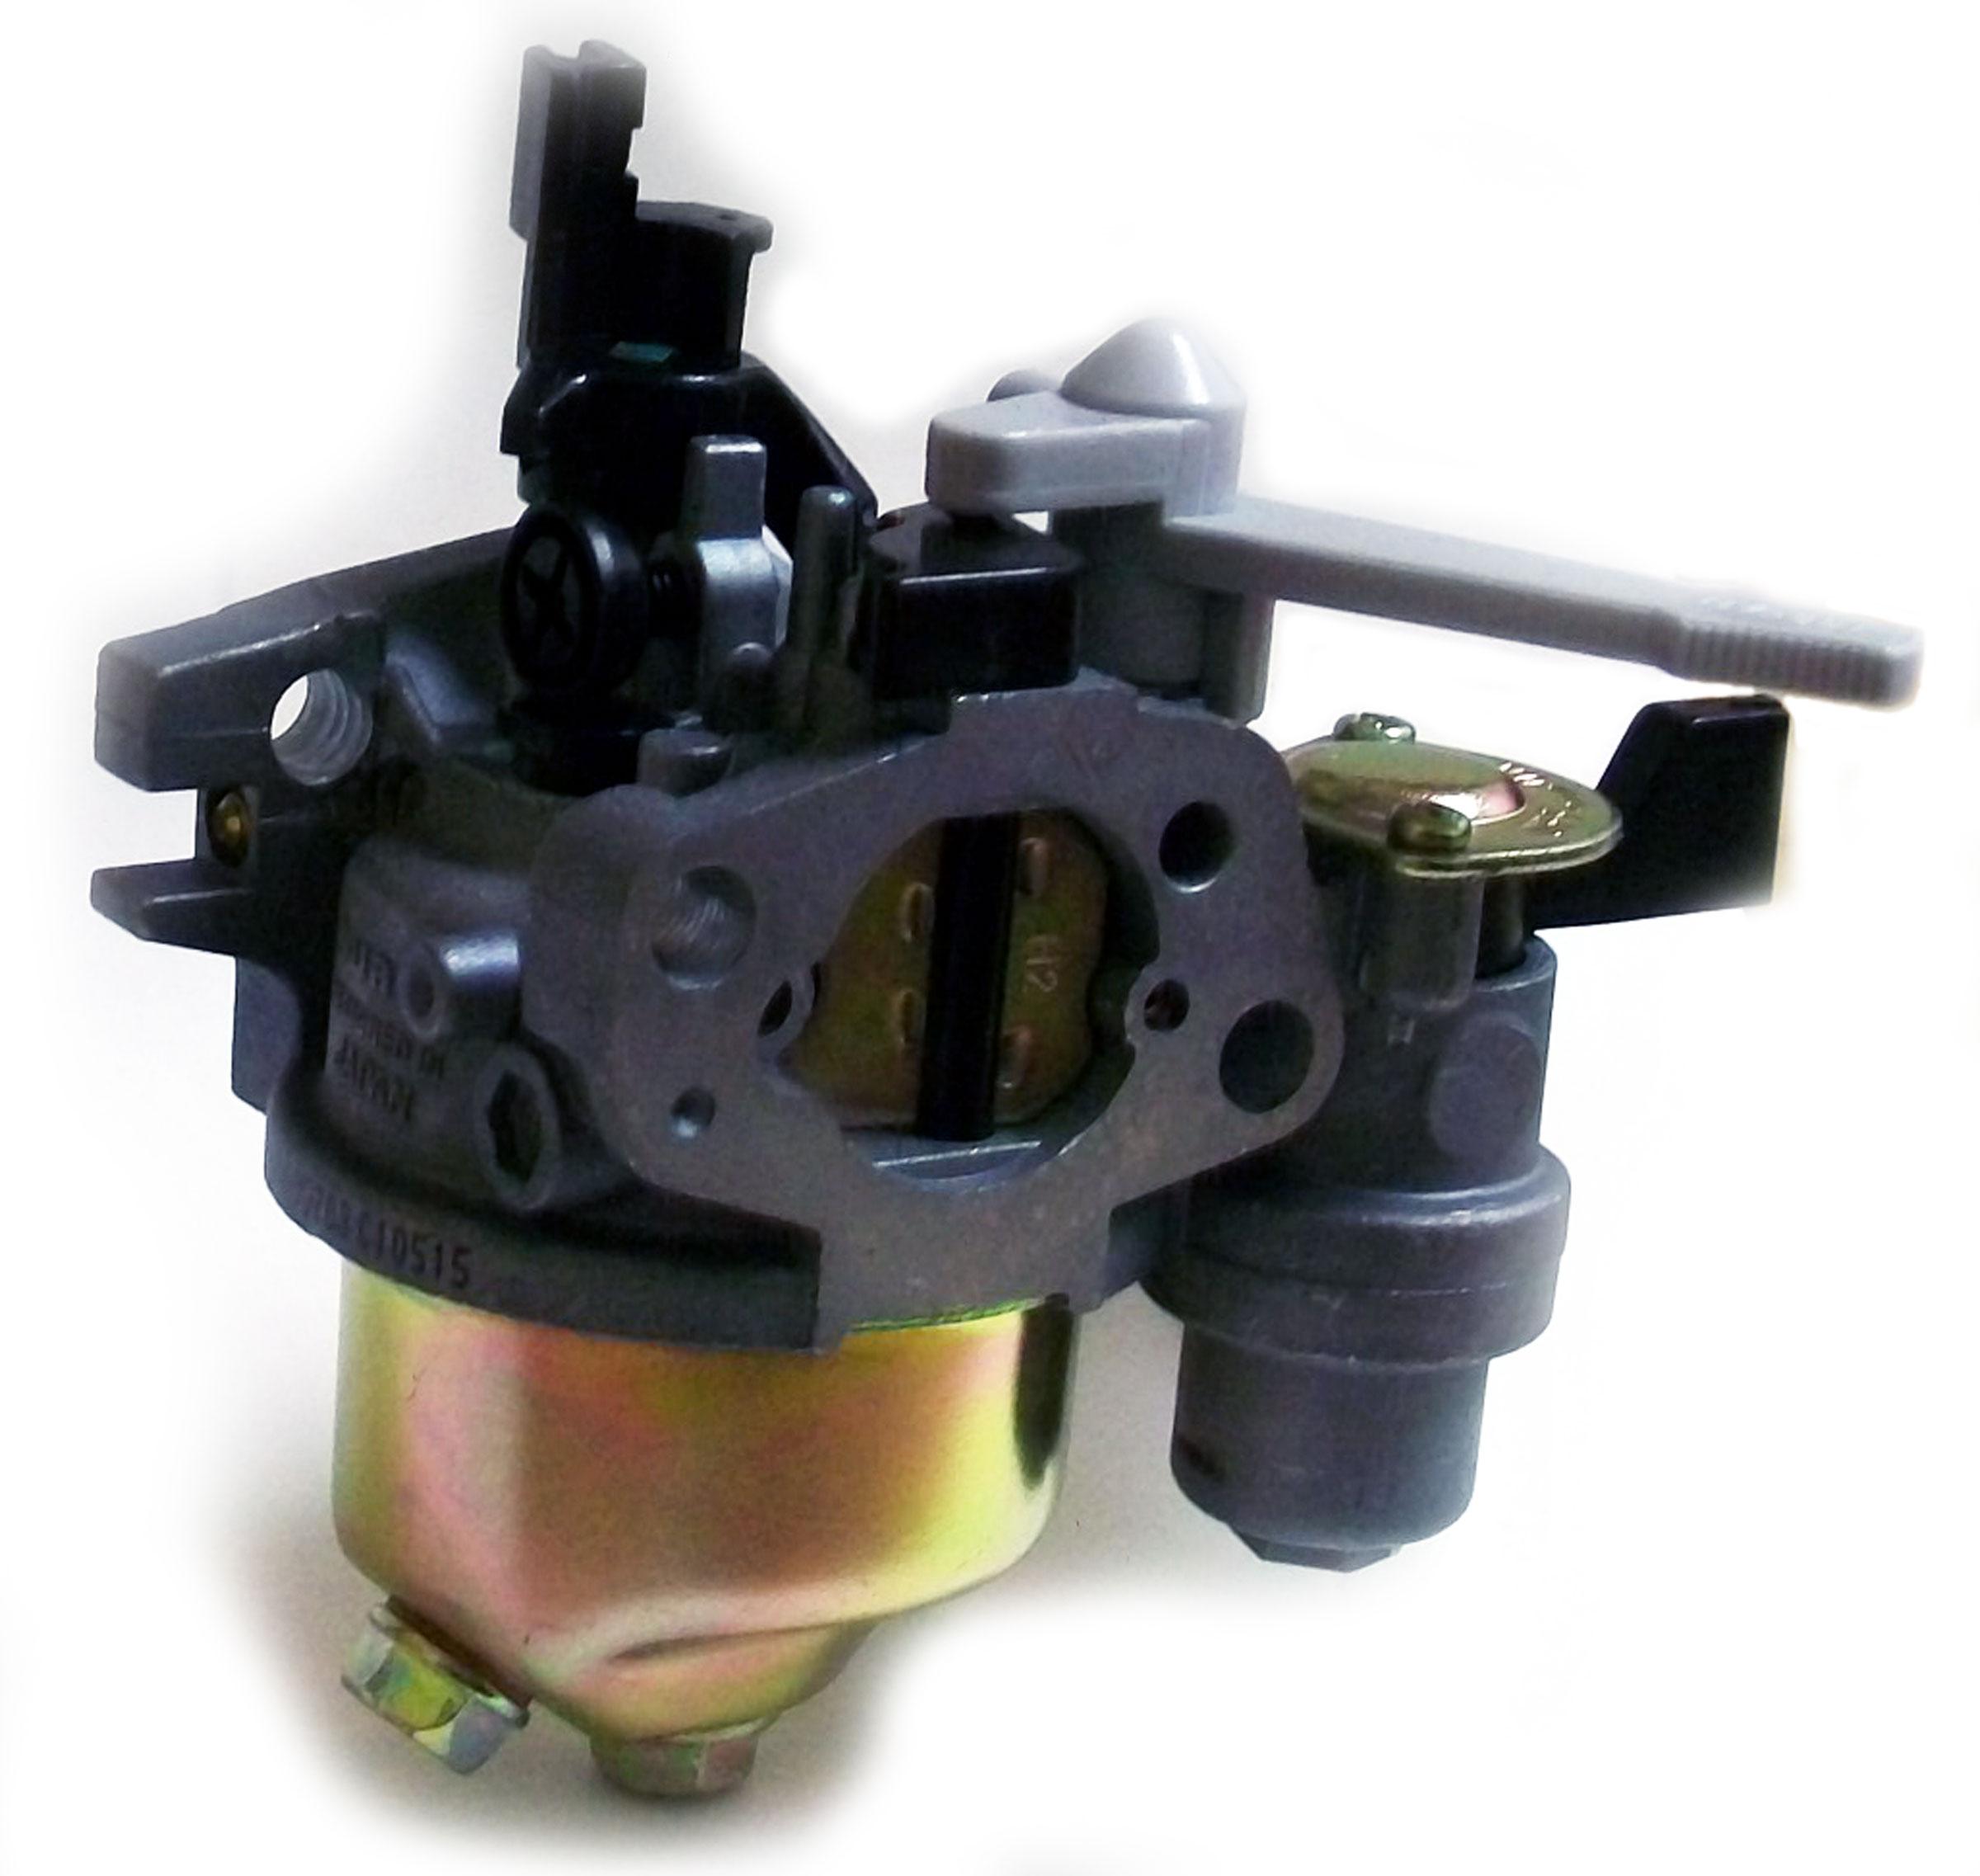 honda 6 5 hp engine parts diagram 2000 jeep grand cherokee infinity stereo wiring carburetor by ruixing for gx200 clone